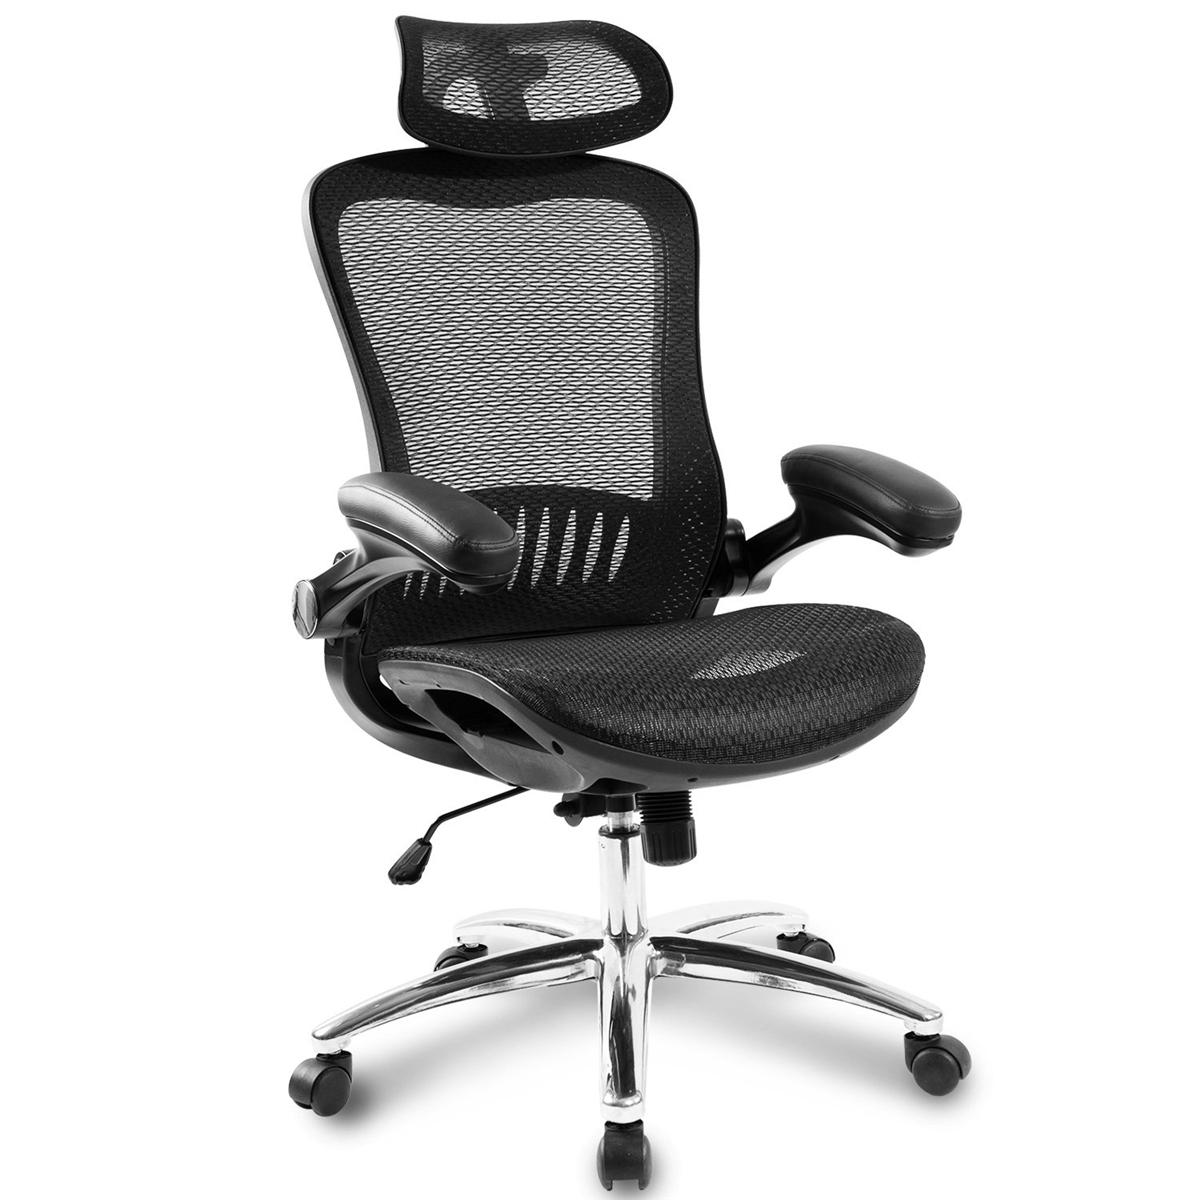 Merax Modern Office Chair Ergonomic Mesh Adjustable Height Rotating Lift Chair Chair Reclining Chair Folding Chair